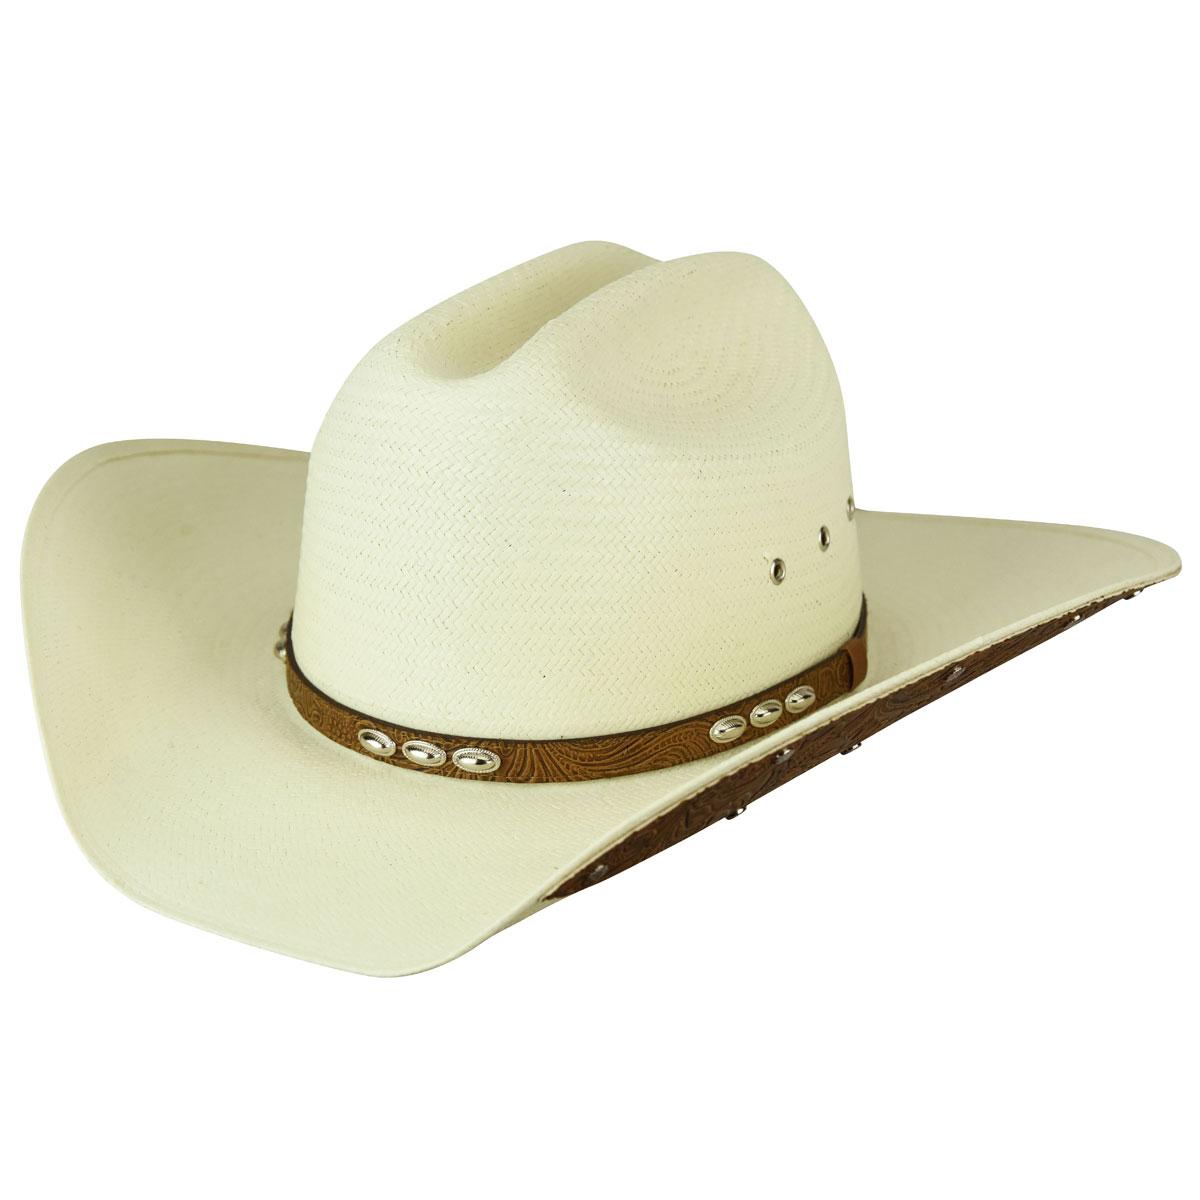 Bailey Western Cutty Western Hat in Natural